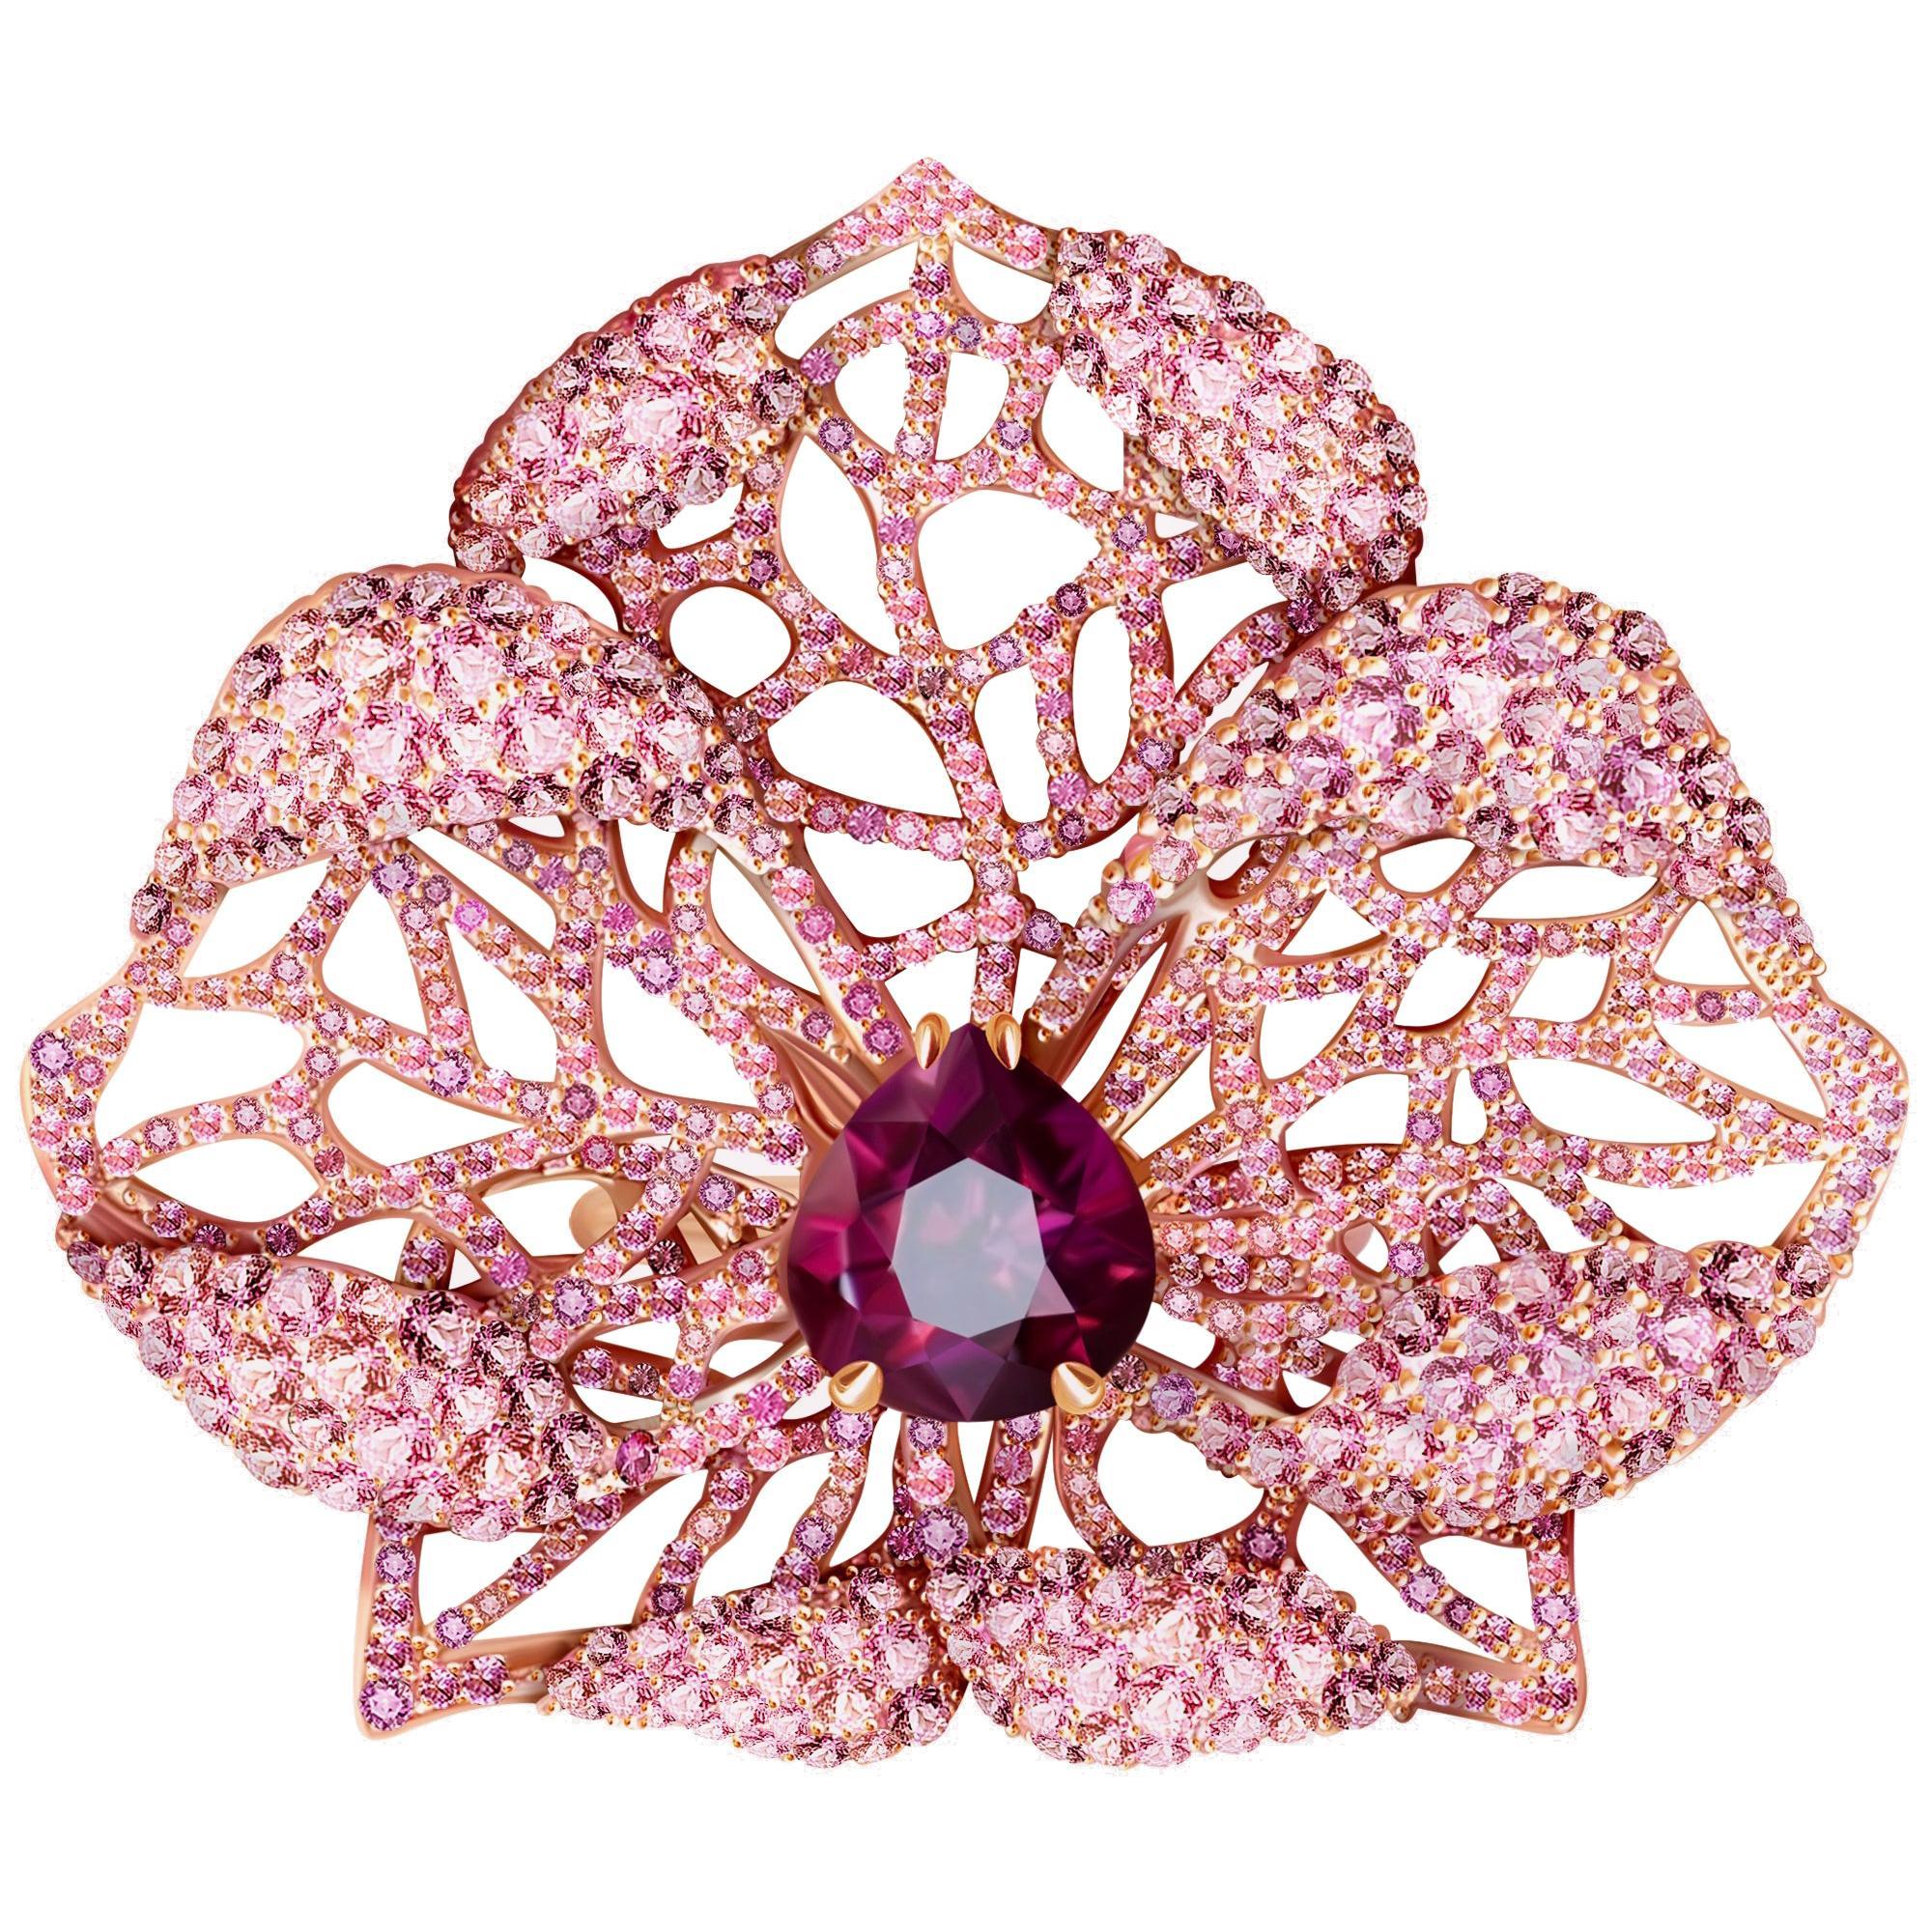 3 Carat Purple Spinel Pink Sapphire 18 Karat Rose Gold Flower Cocktail Ring